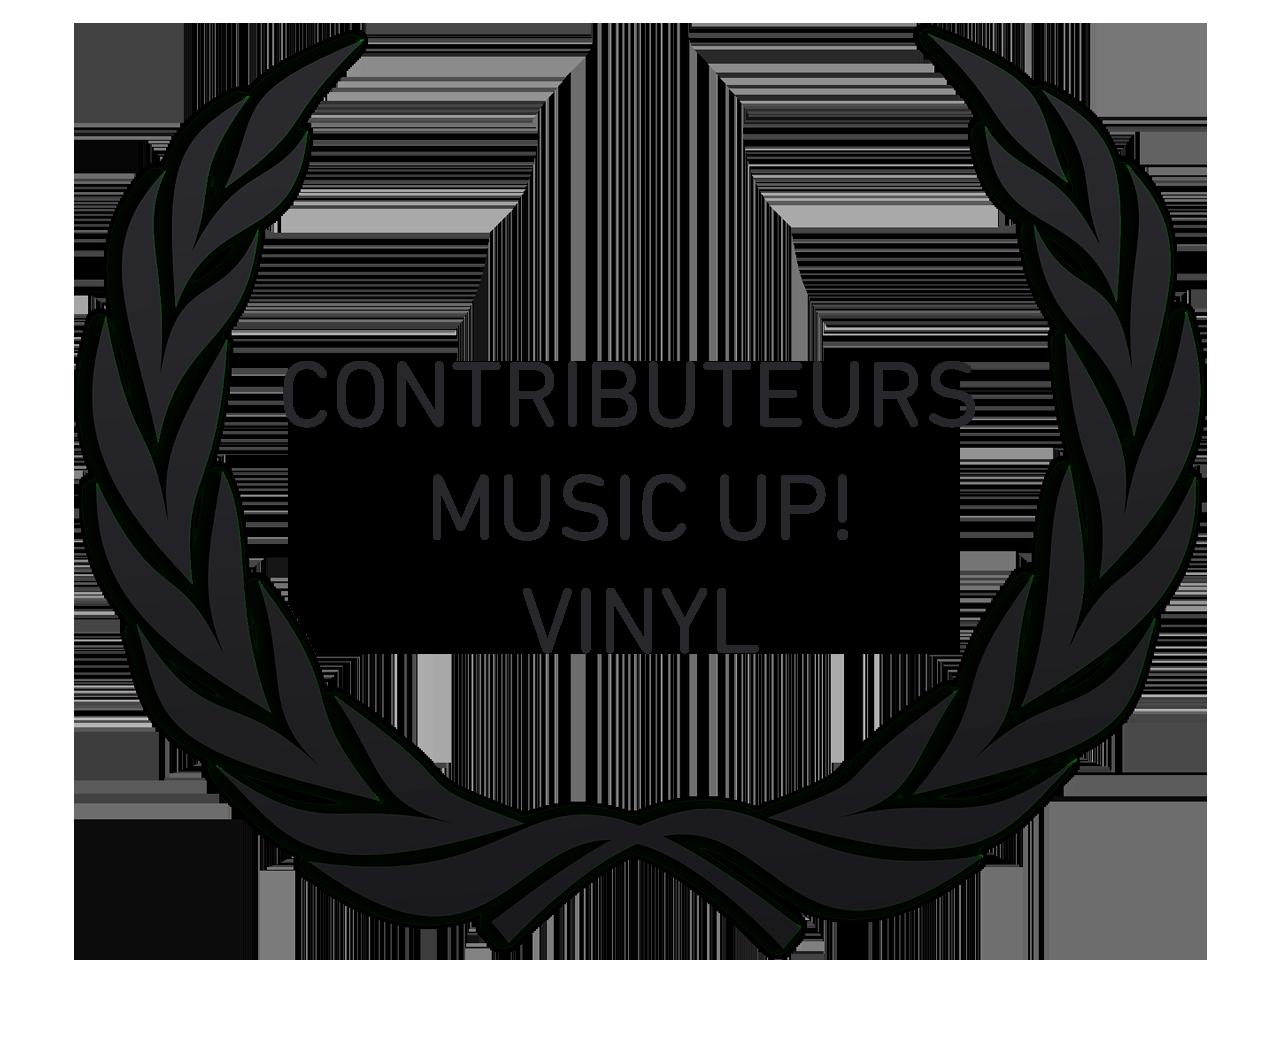 vinyle-1503853555.png